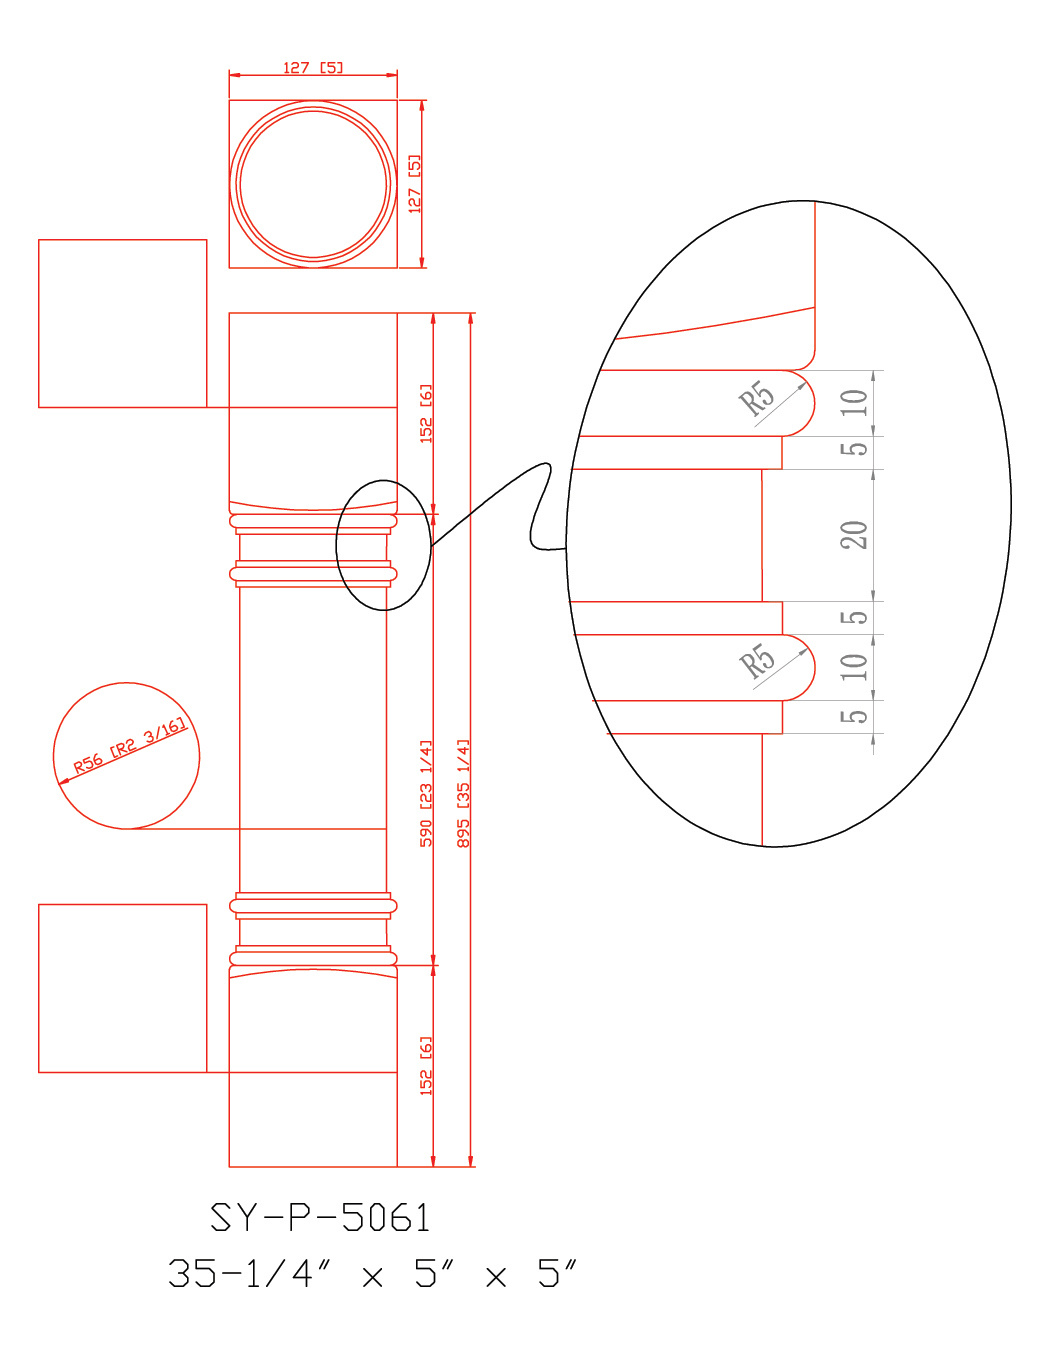 SY-P-5061 drawing